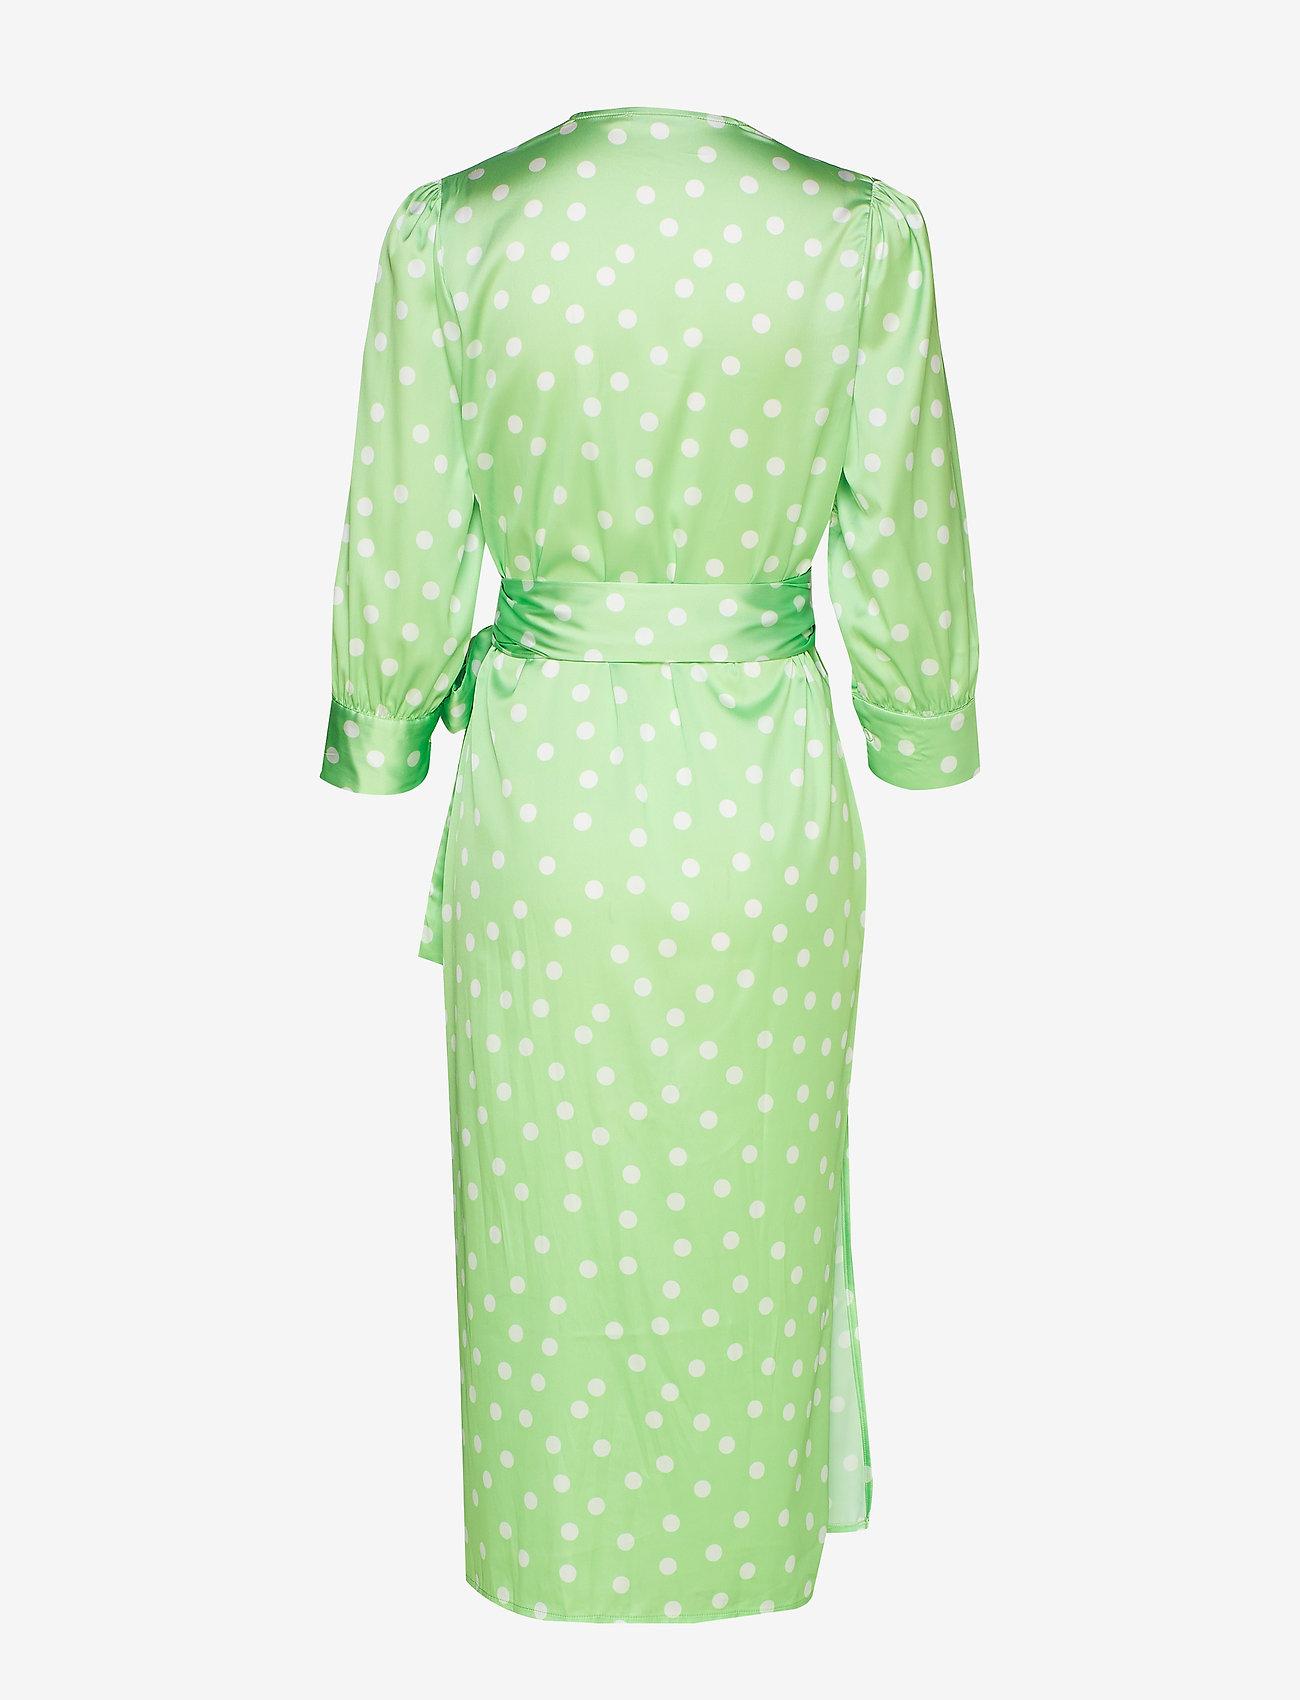 Cowry Dots Dress  - Aéryne